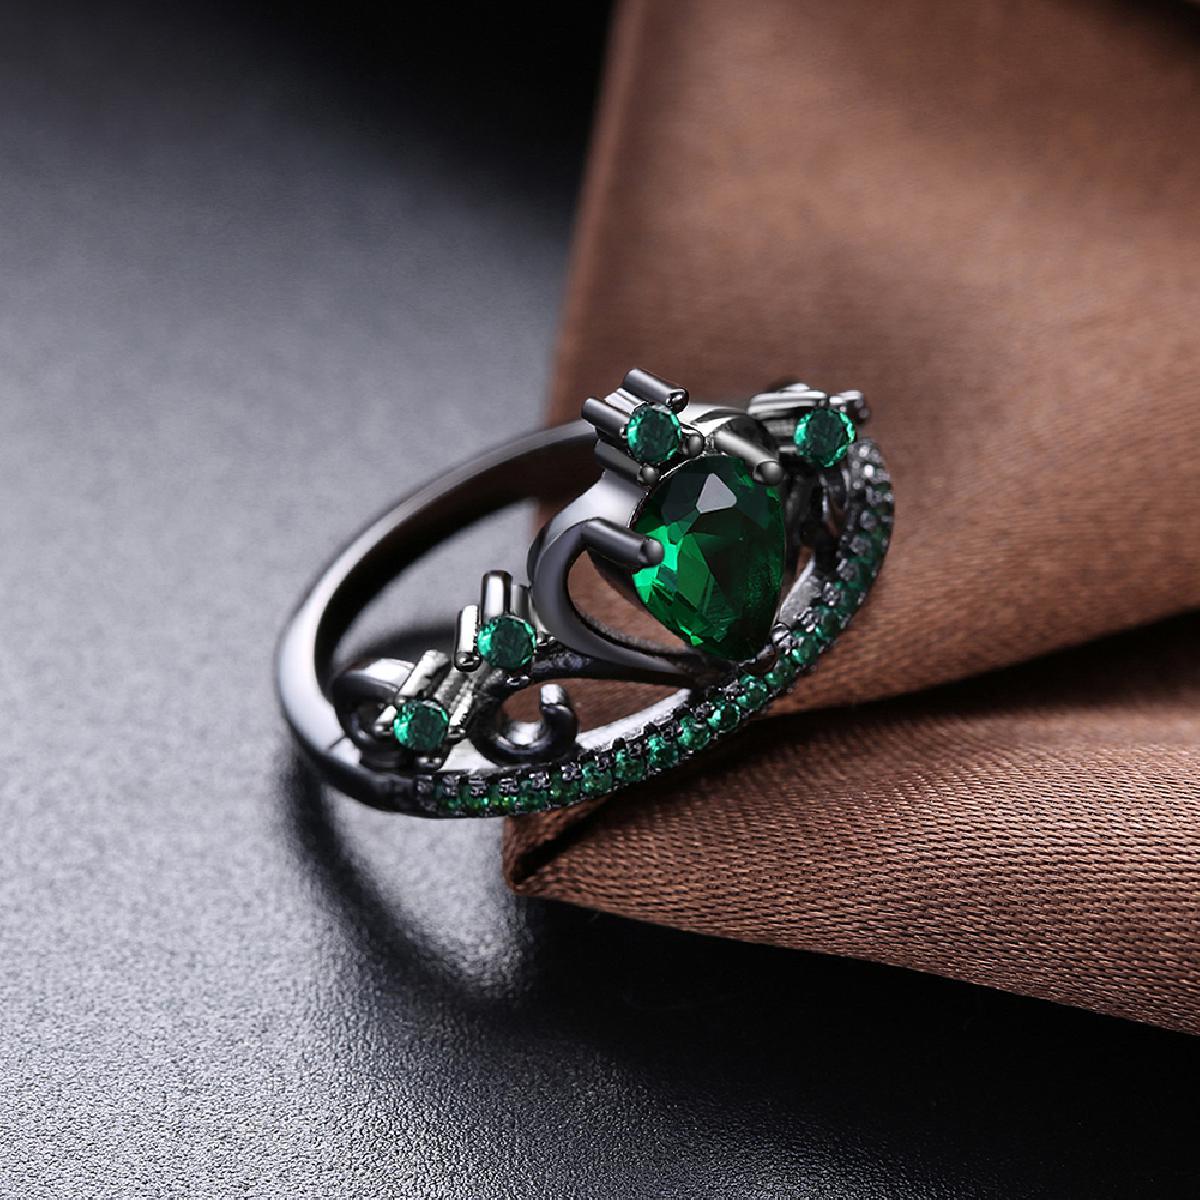 Magical Queen's Crown Rings